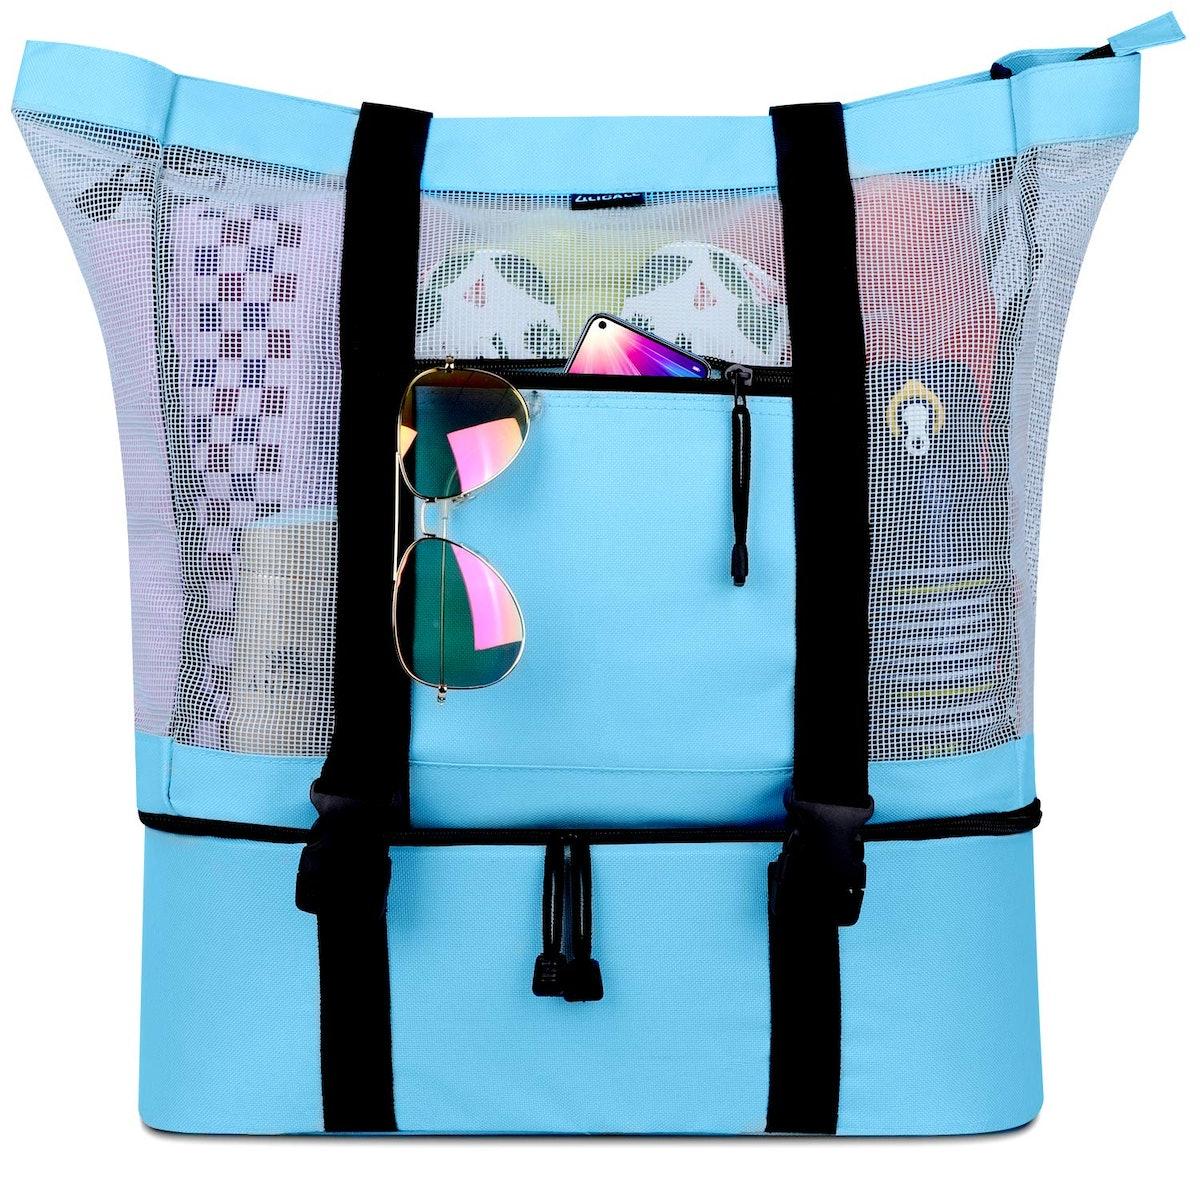 LILICALL Mesh Beach Tote Bag With Detachable Beach Cooler